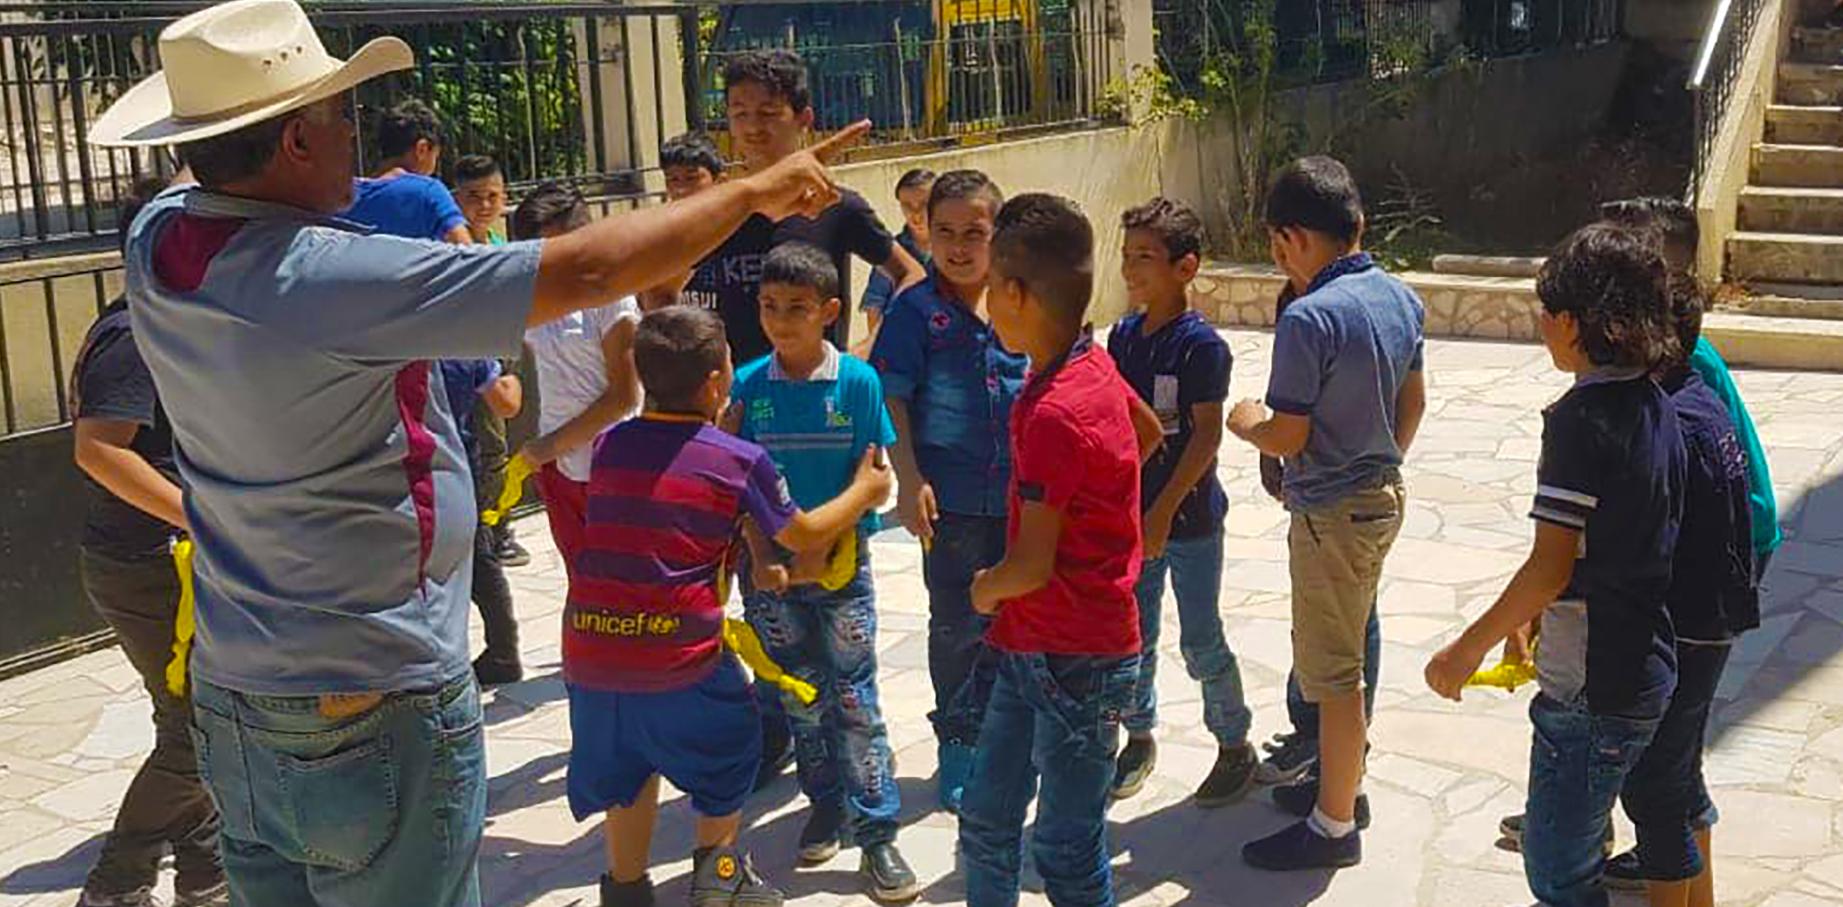 Muhammad with Kids